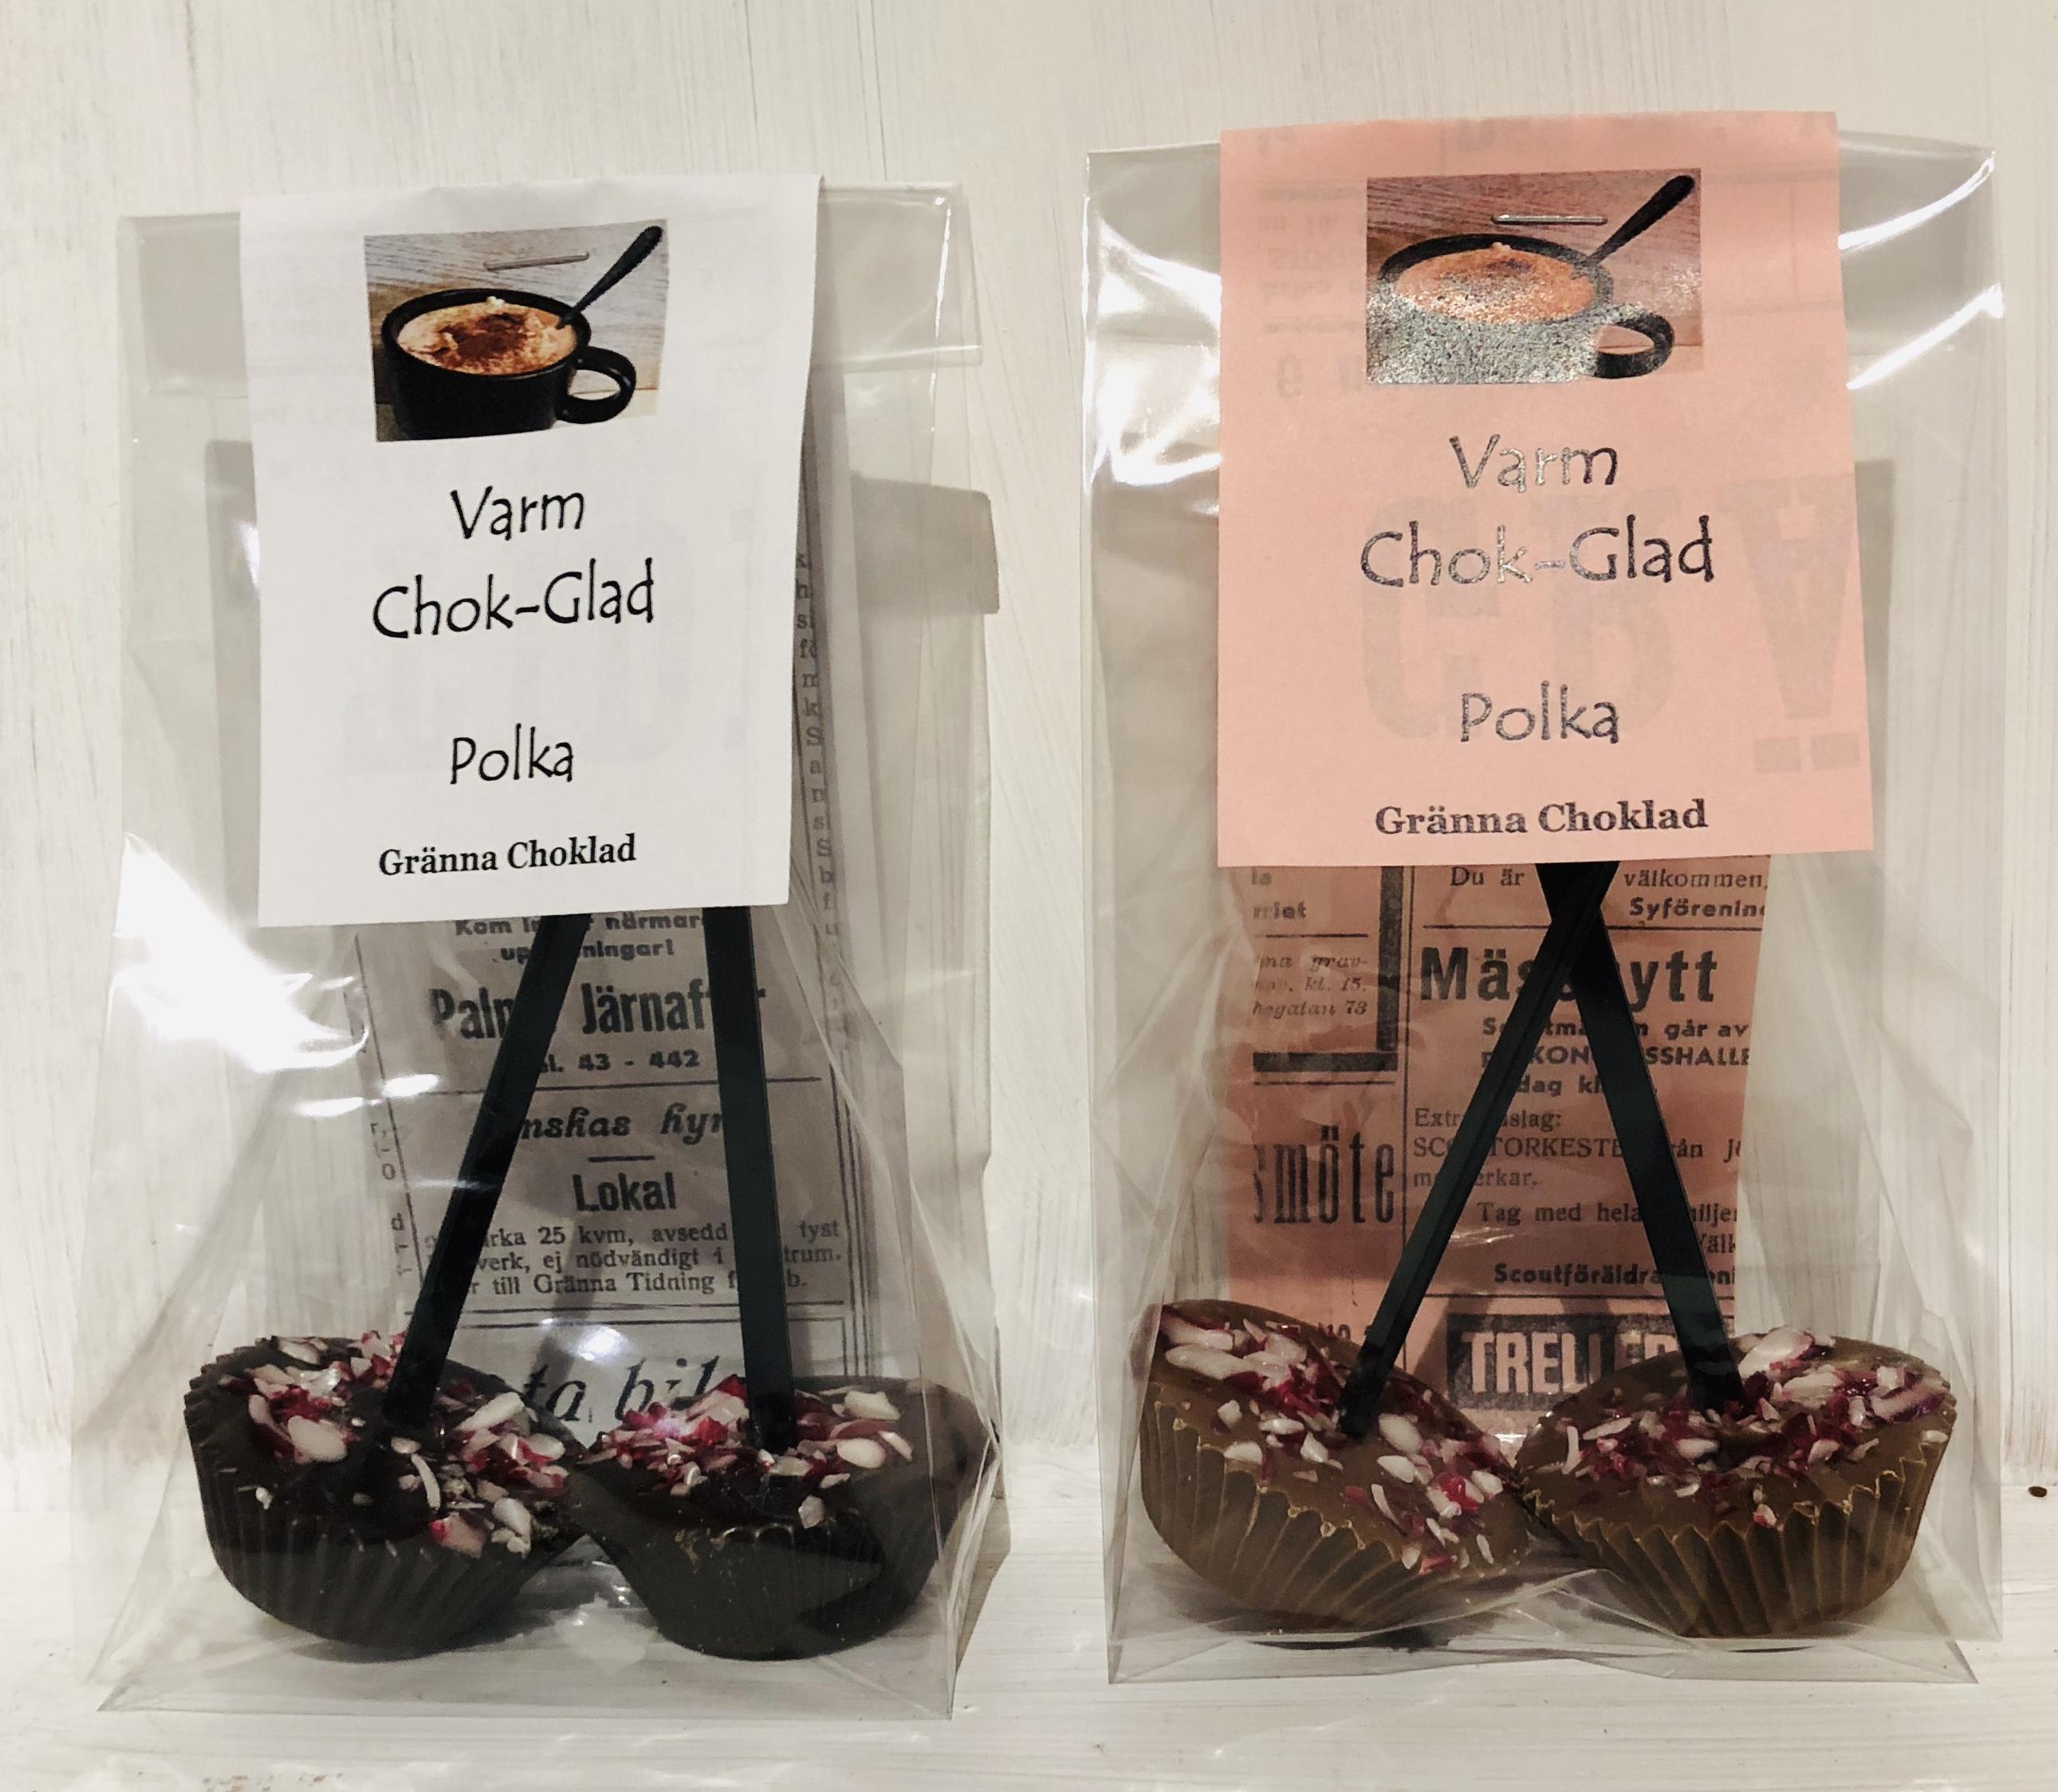 Chokladmjölksklubba Mörk Polka